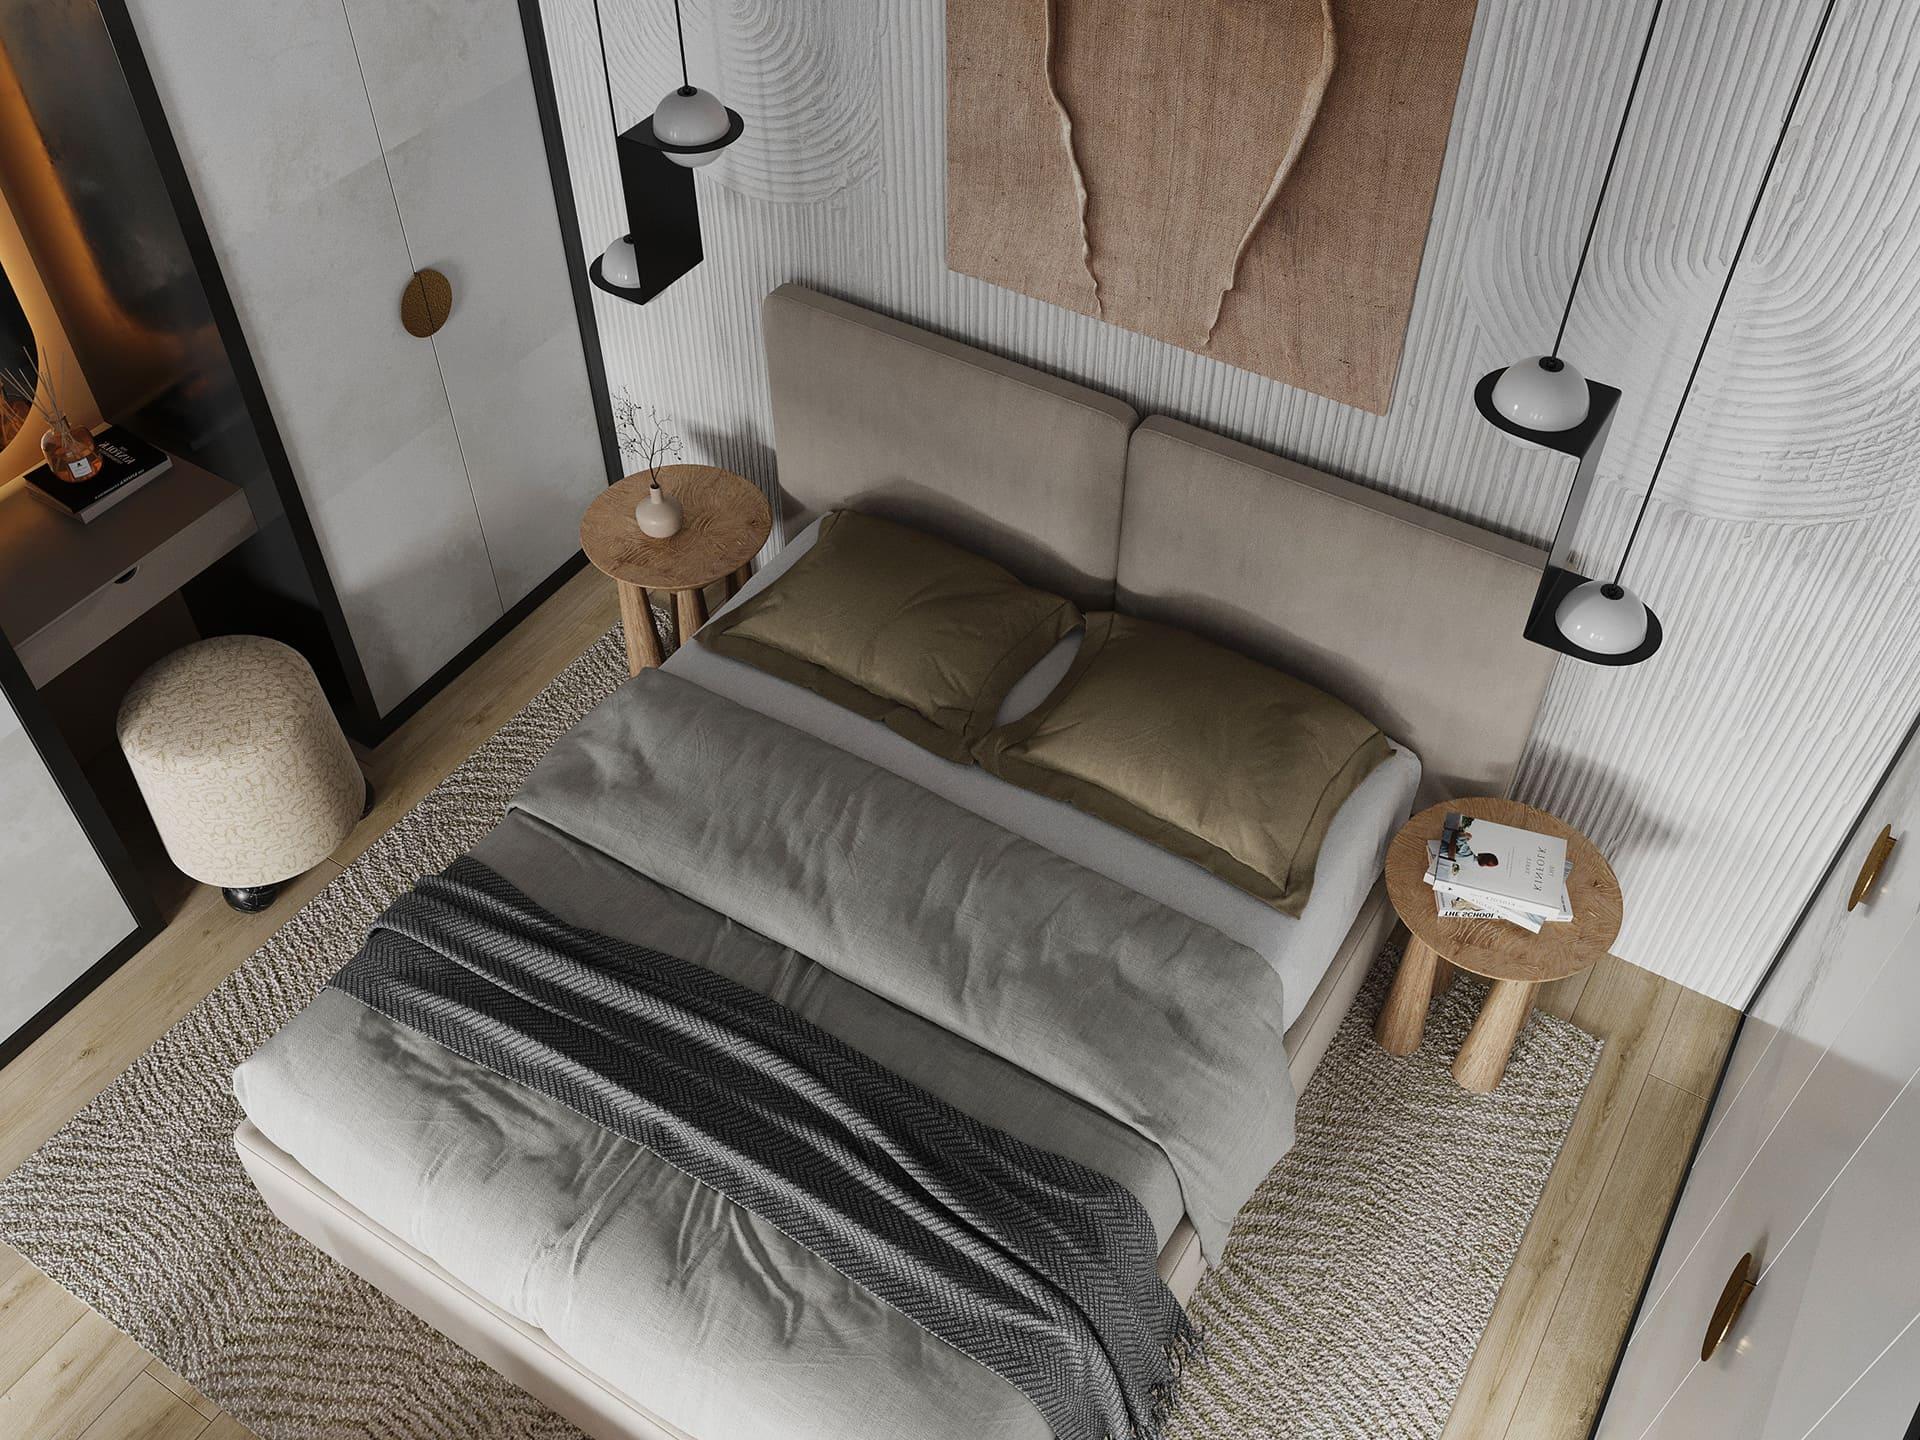 дизайн интерьера модной квартиры фото 27